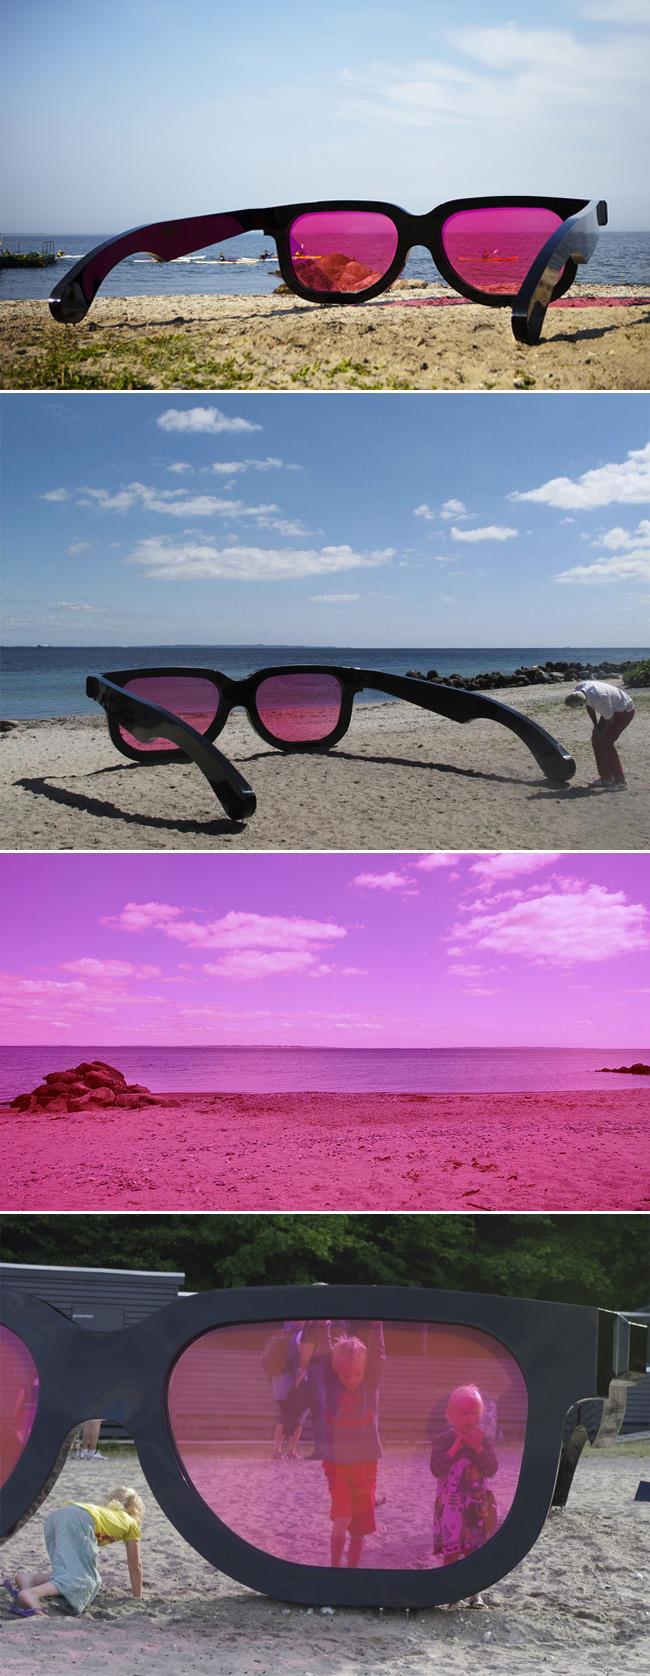 Pop art, sculpture, contemporary, sculpture by the sea